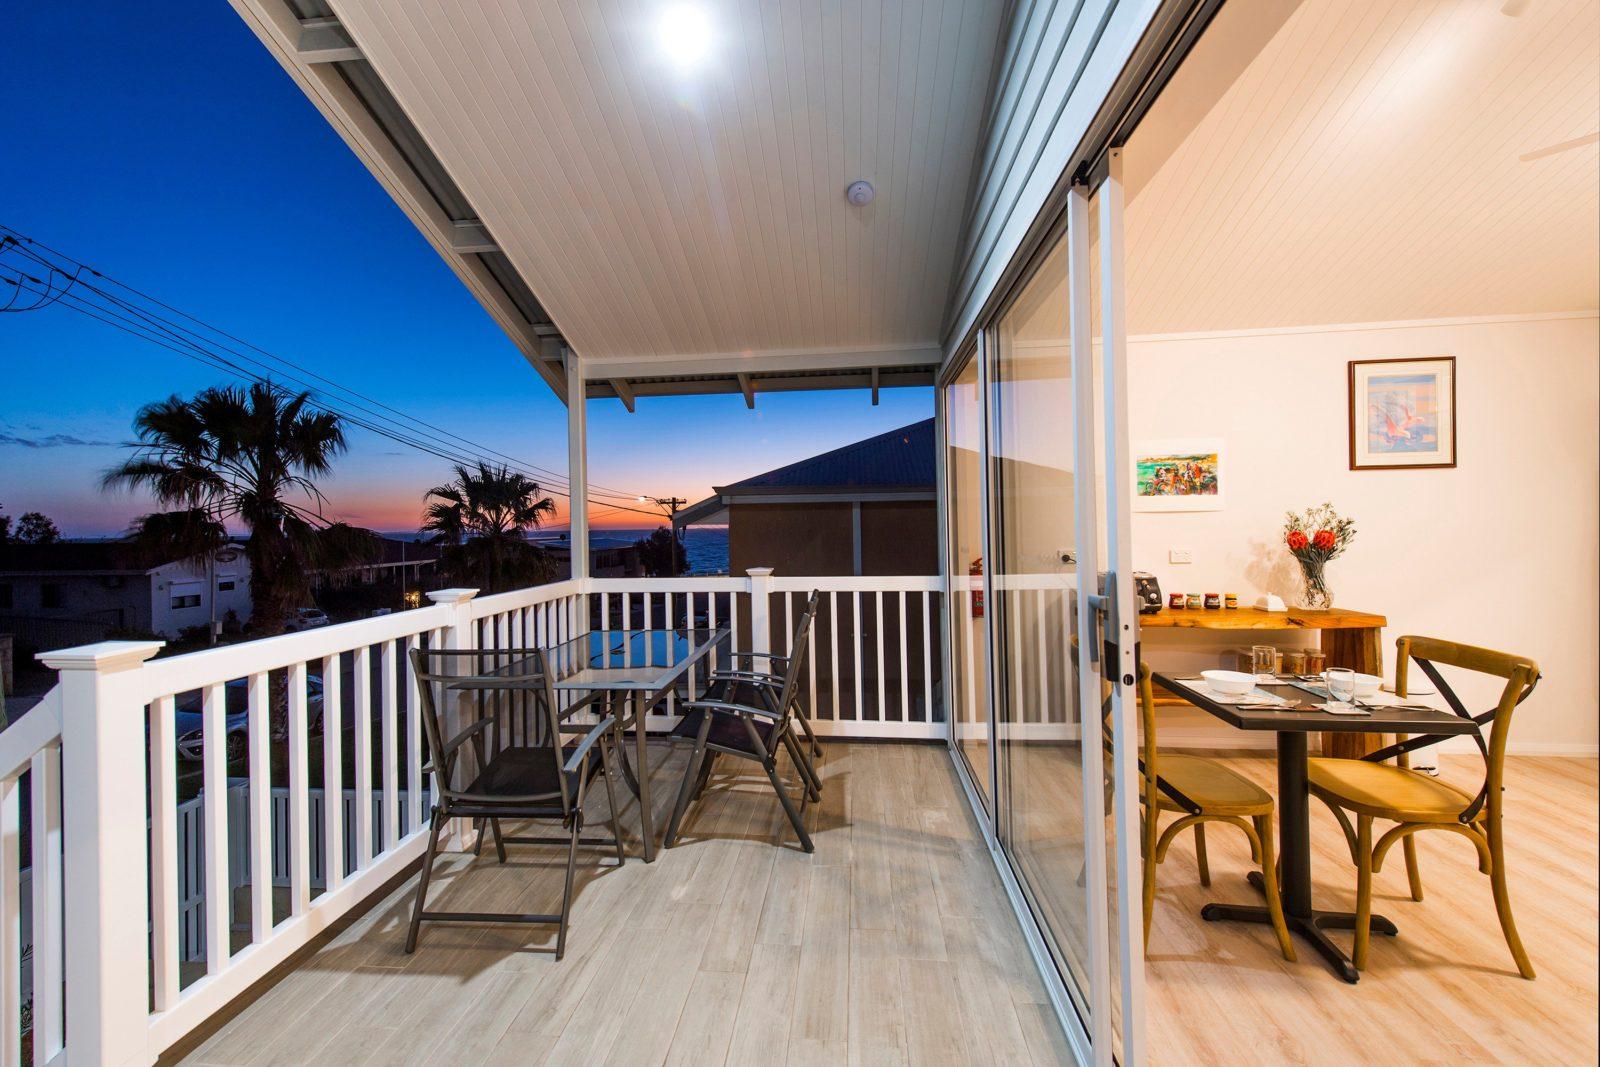 North Beach Bed and Breakfast, North Beach, Western Australia